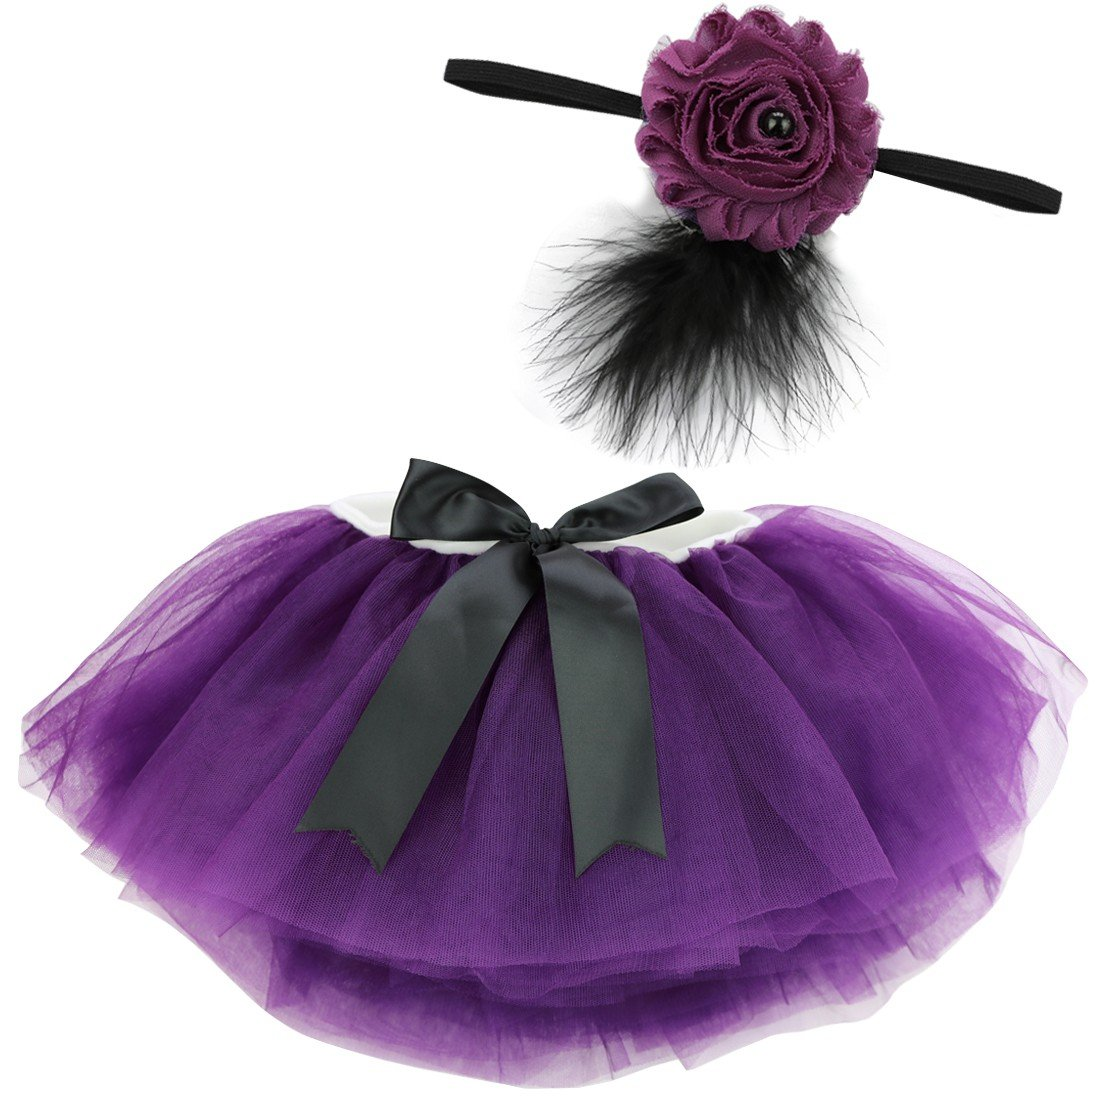 YiZYiF Fotos Fotografie Prop Baby Mä dchen Kostü m Sü ß er Prinzessin Kleid Tü llkleid mit Kopfband Festzug Kleidung (2tlg. Blau)